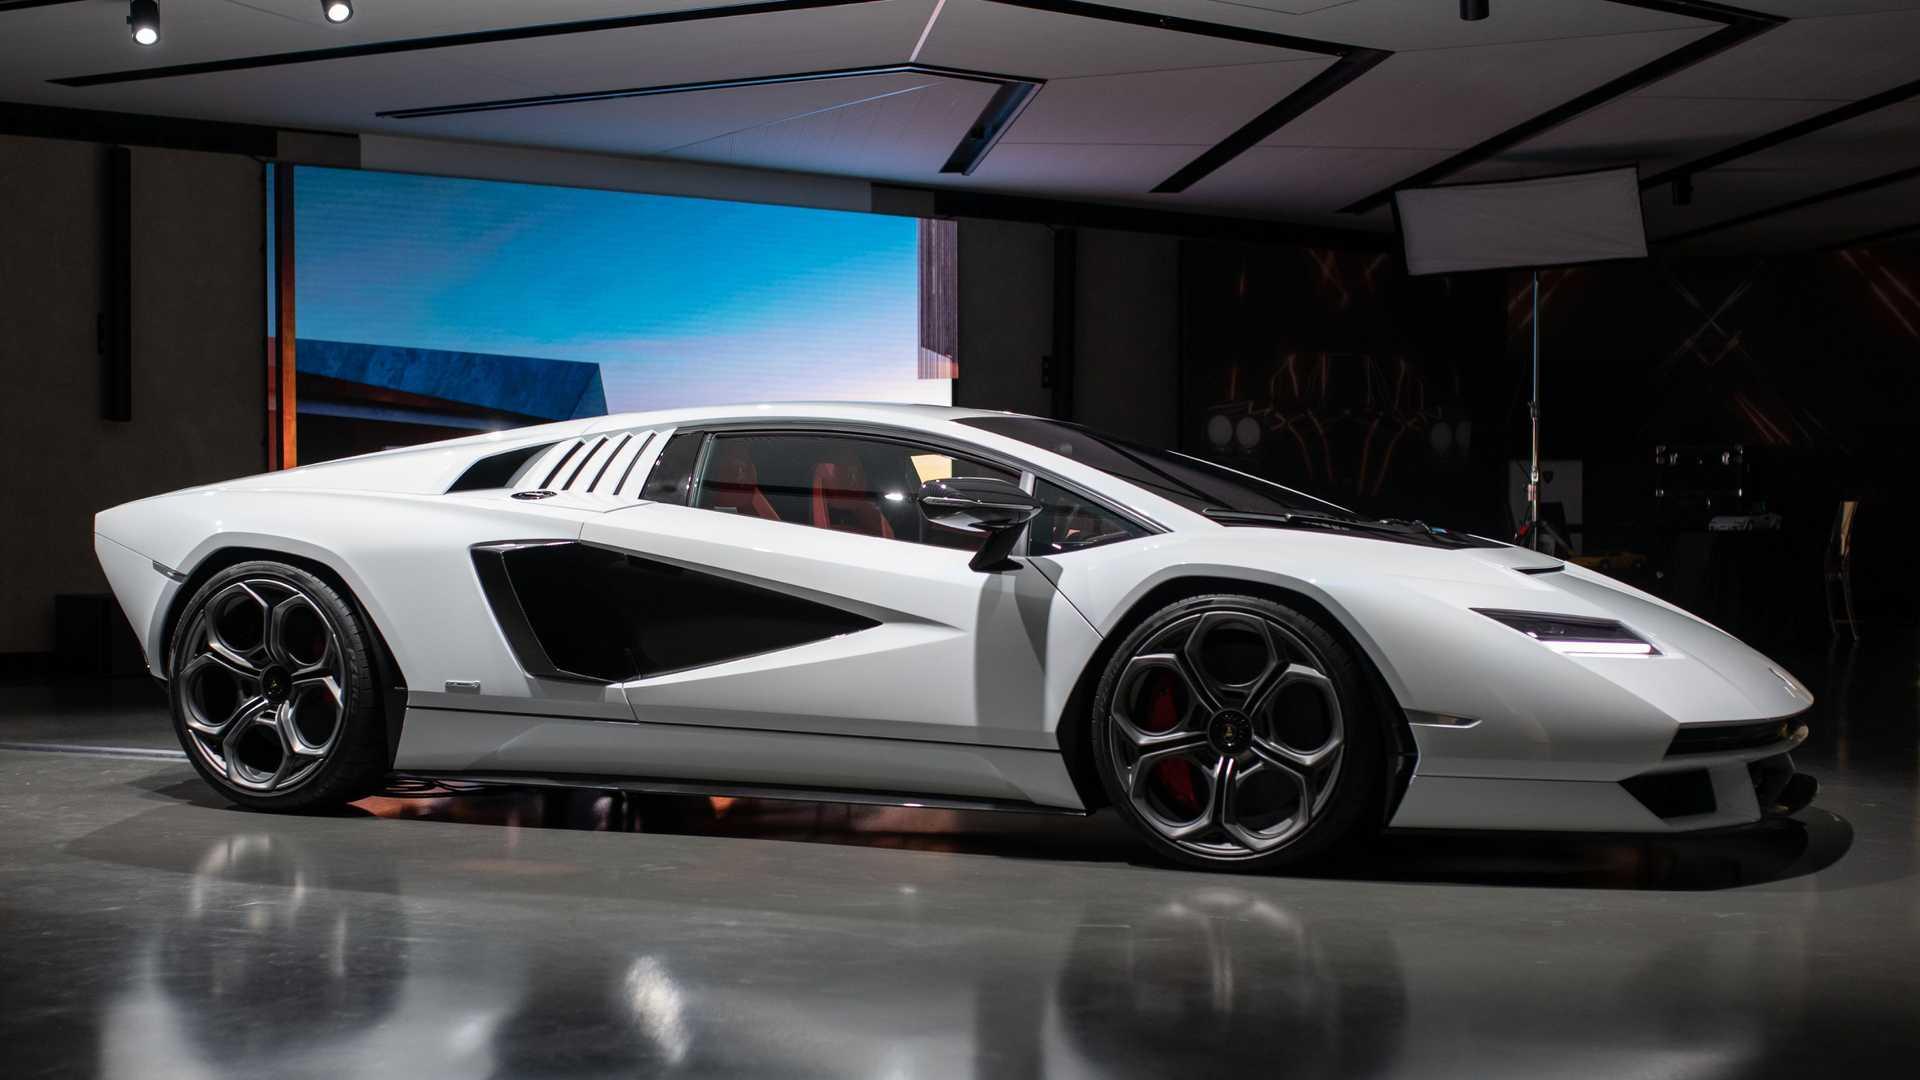 latest model Lamborghini Countach Lpi 800